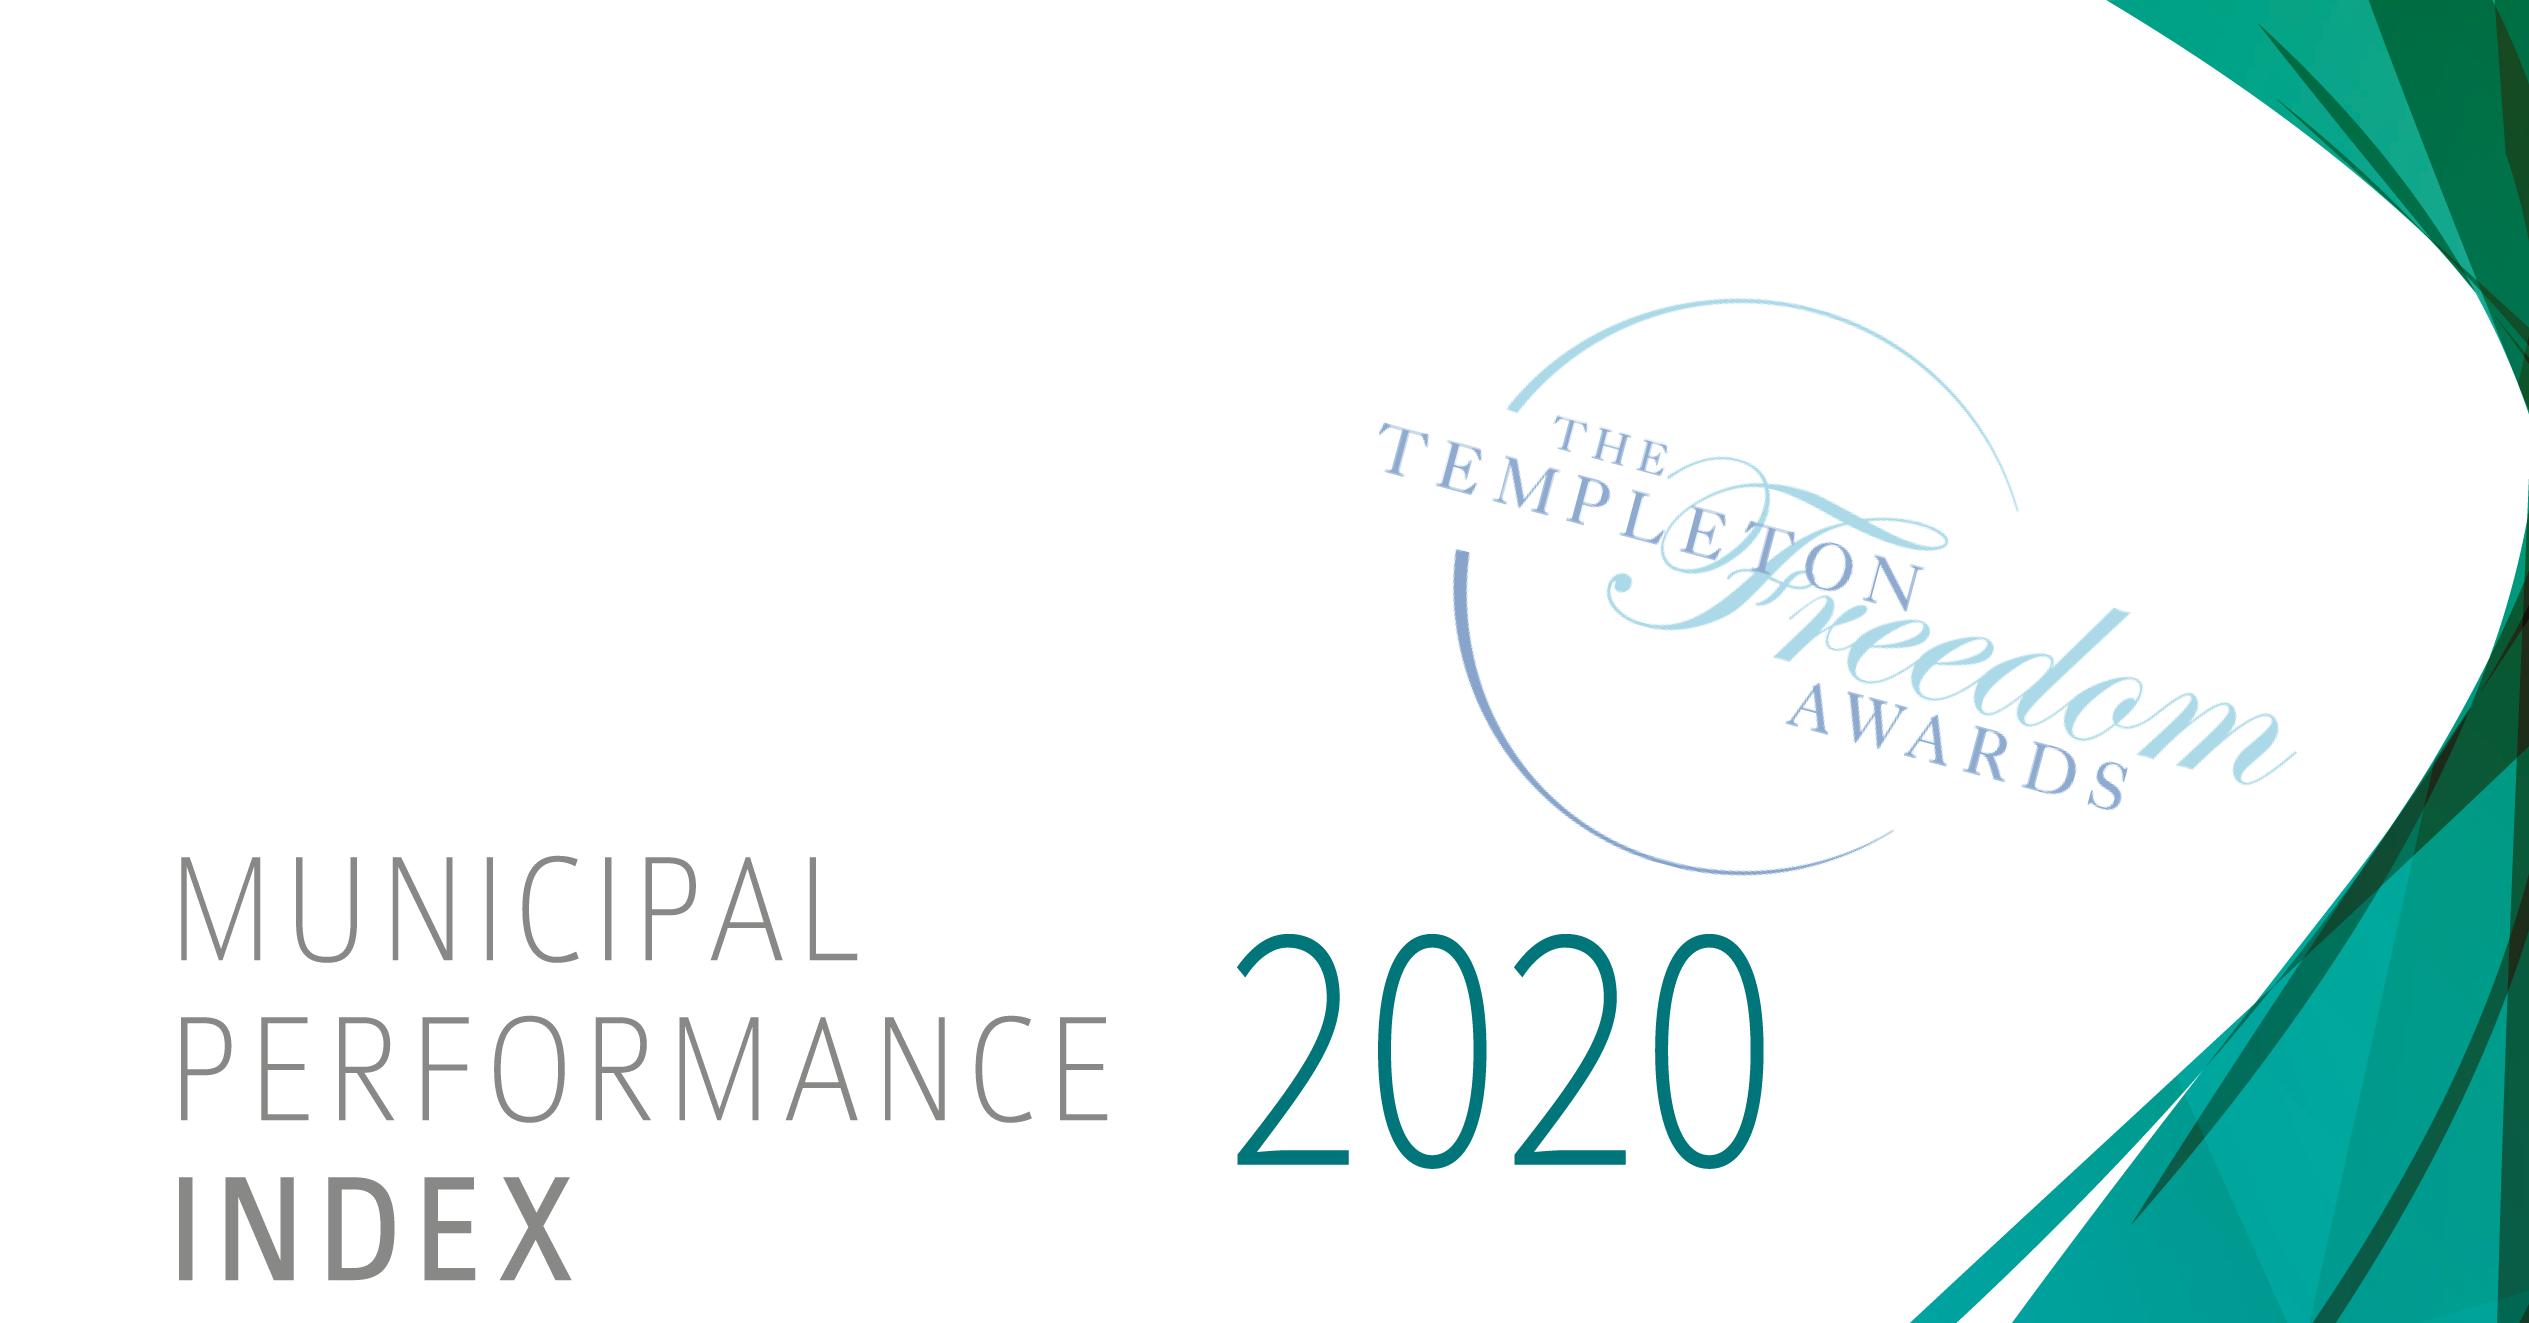 Municipal Performance Index for Albania 2020